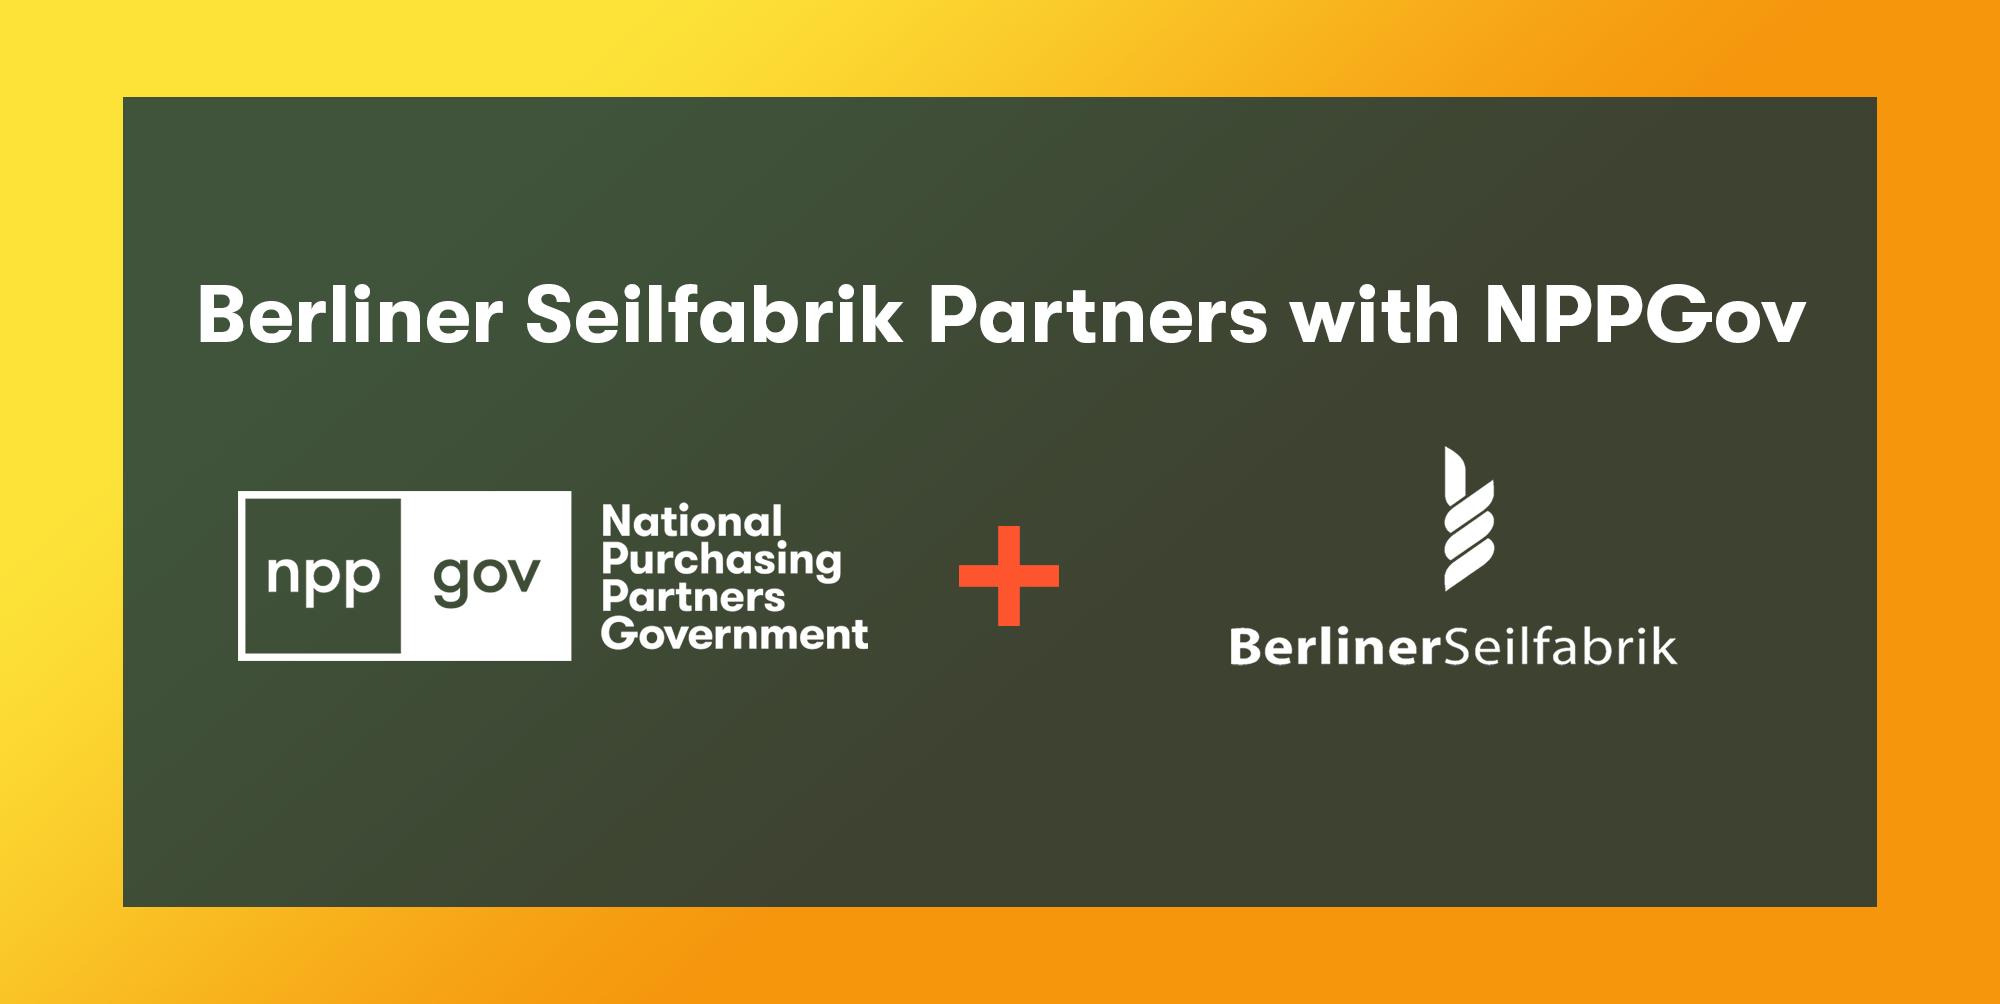 Berliner Seilfabrik Play Equipment Partners with NPPGov